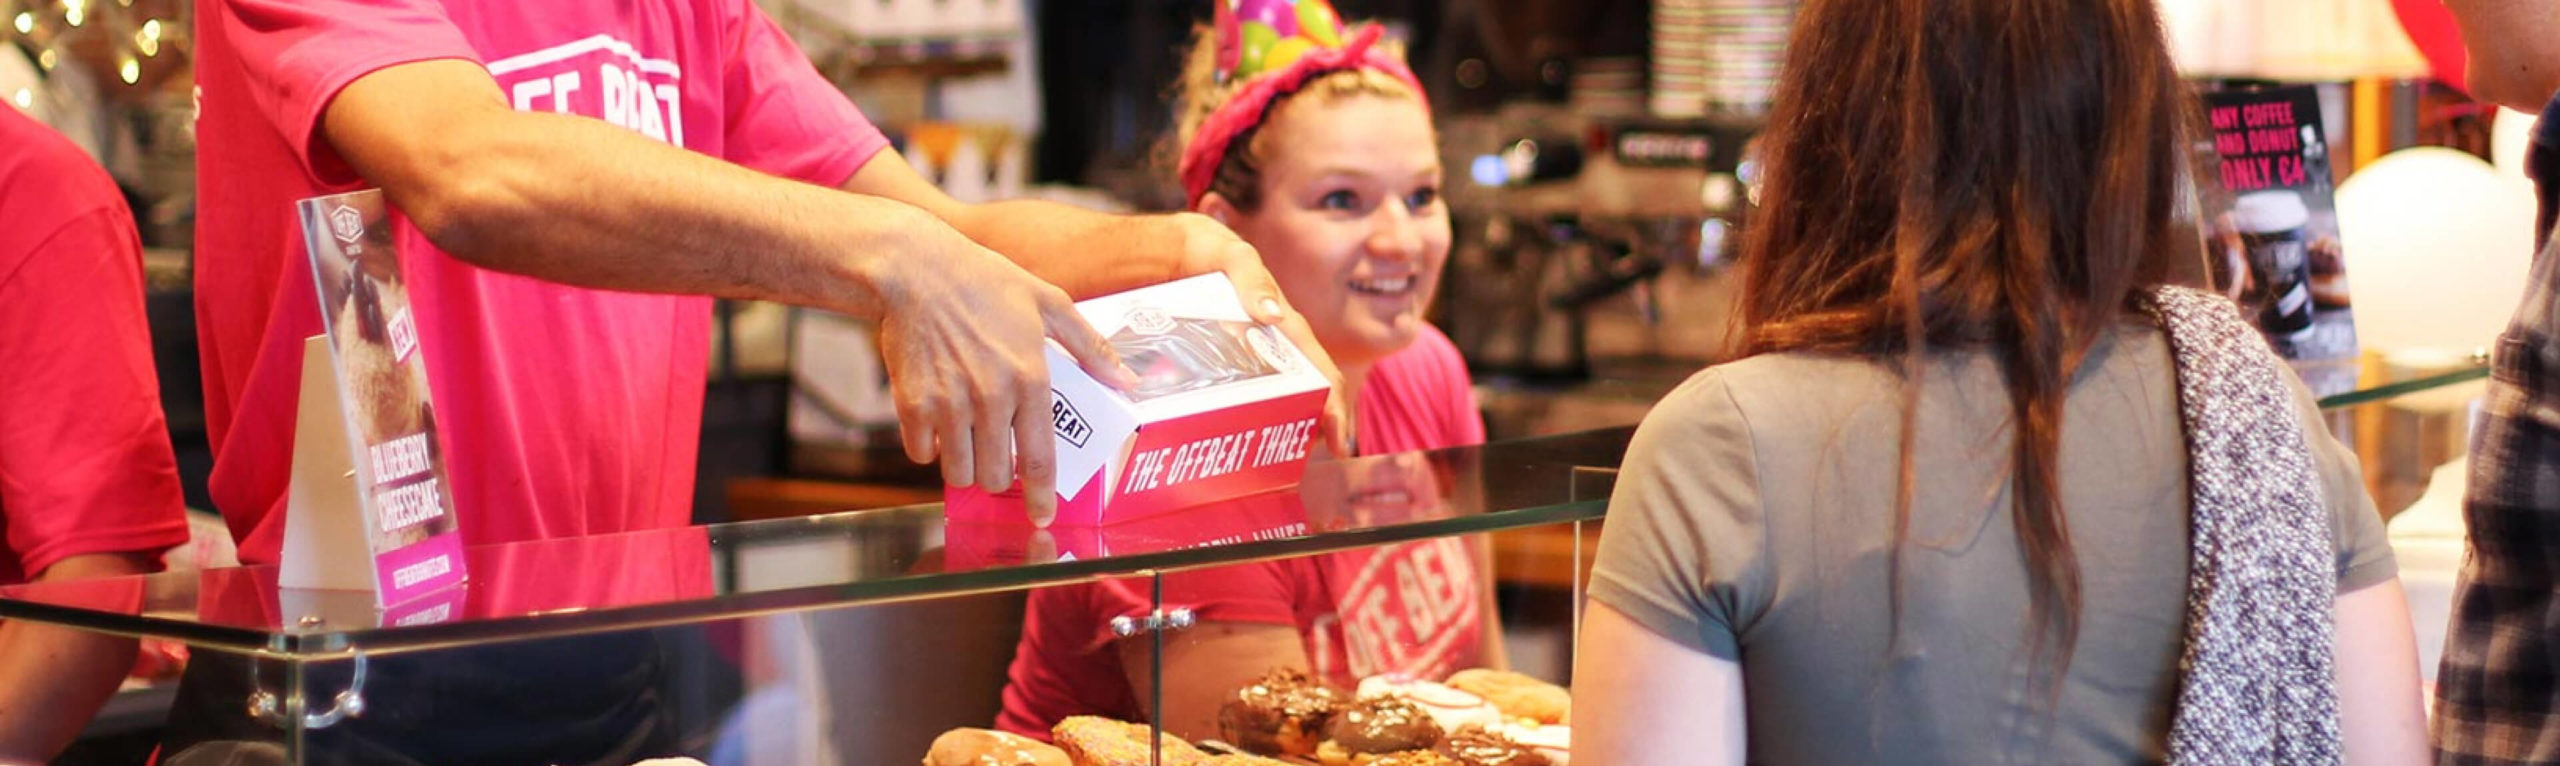 Offbeat Donut's employee serving a costumer